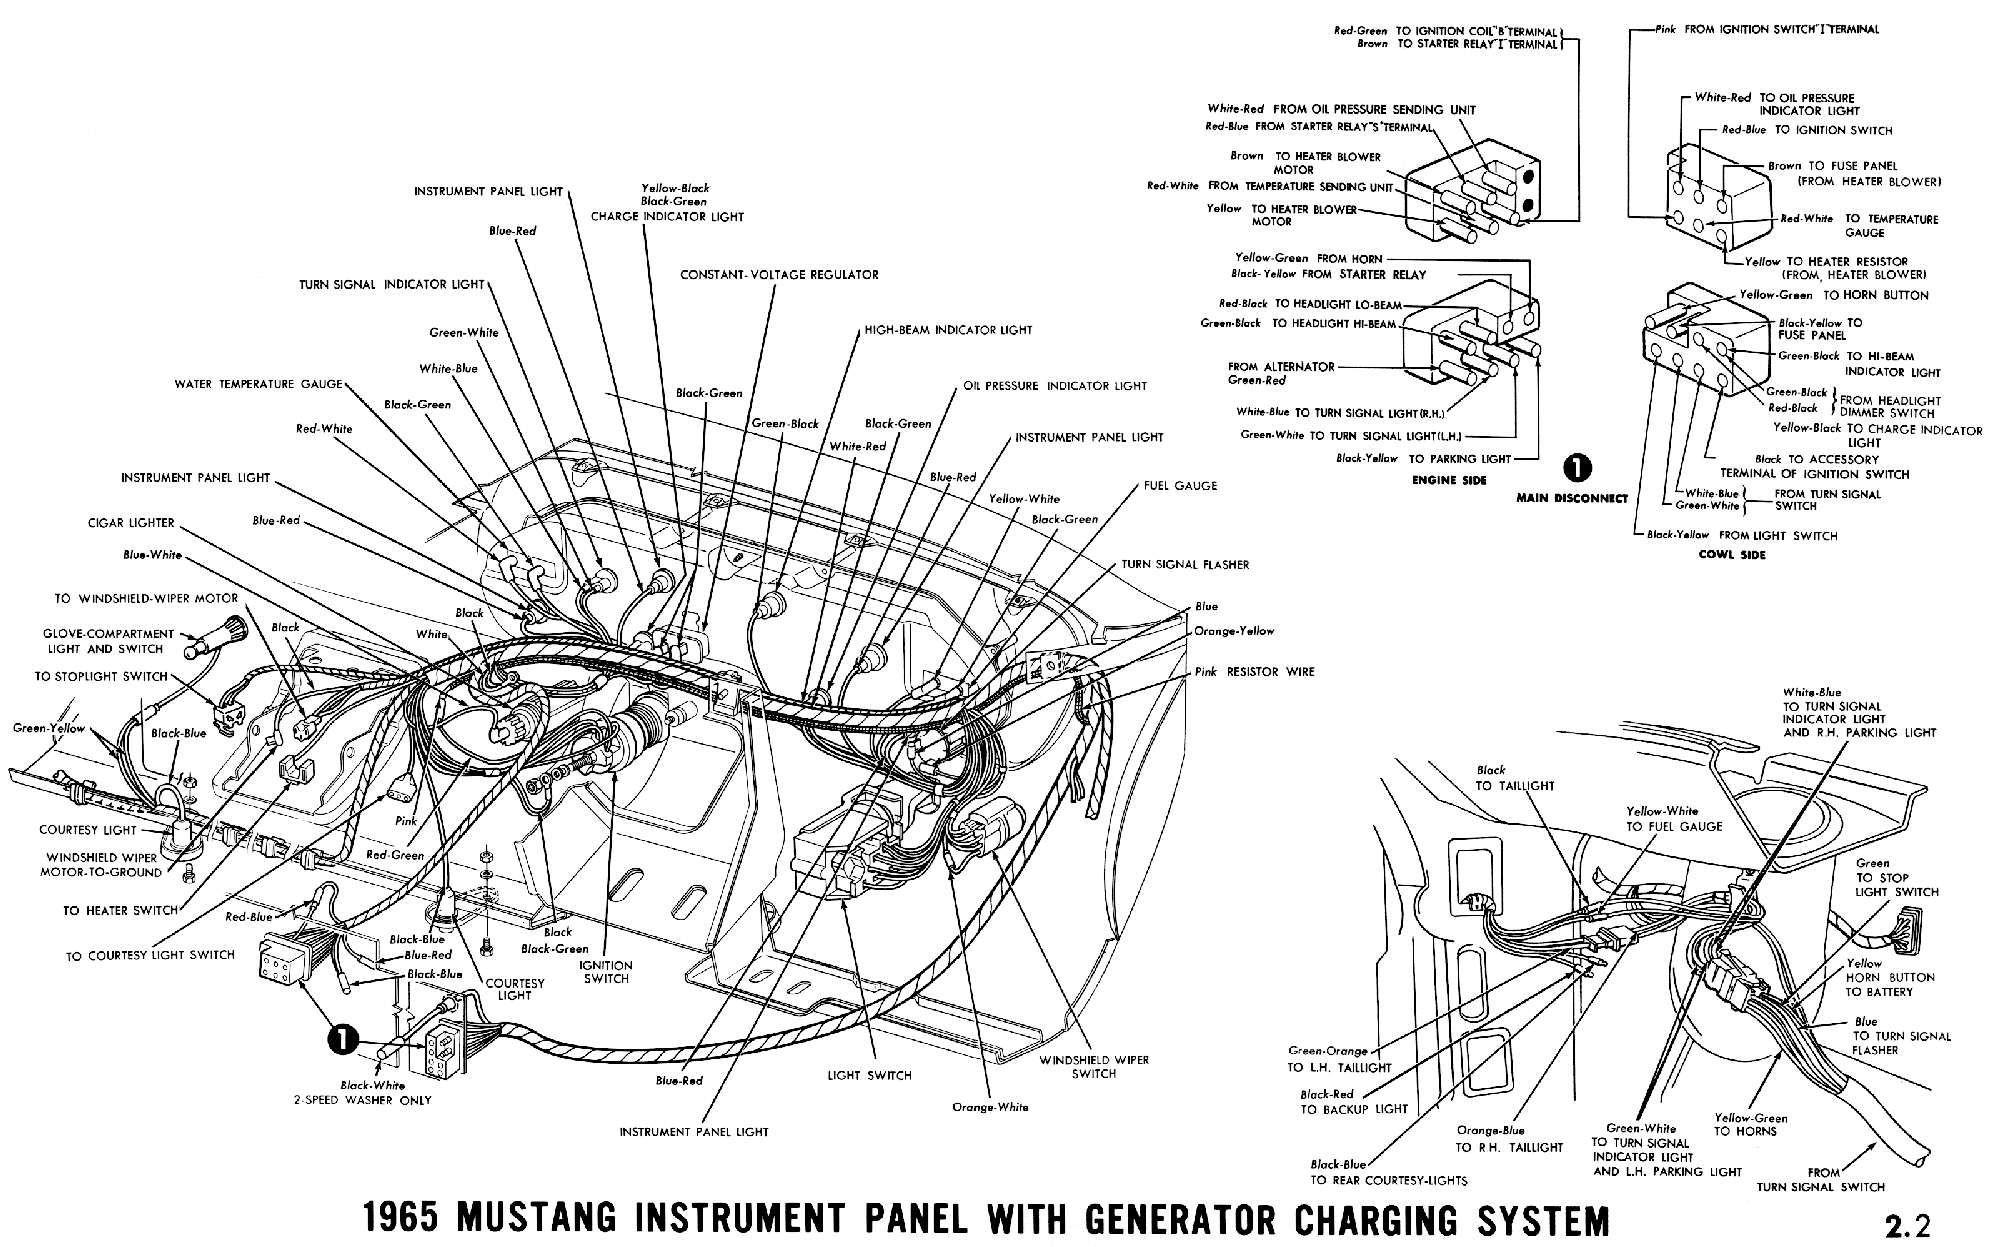 1965 Mustang Wiring Diagrams | Automotive Repair | 1965 mustang, Mustang, Mustang fastback